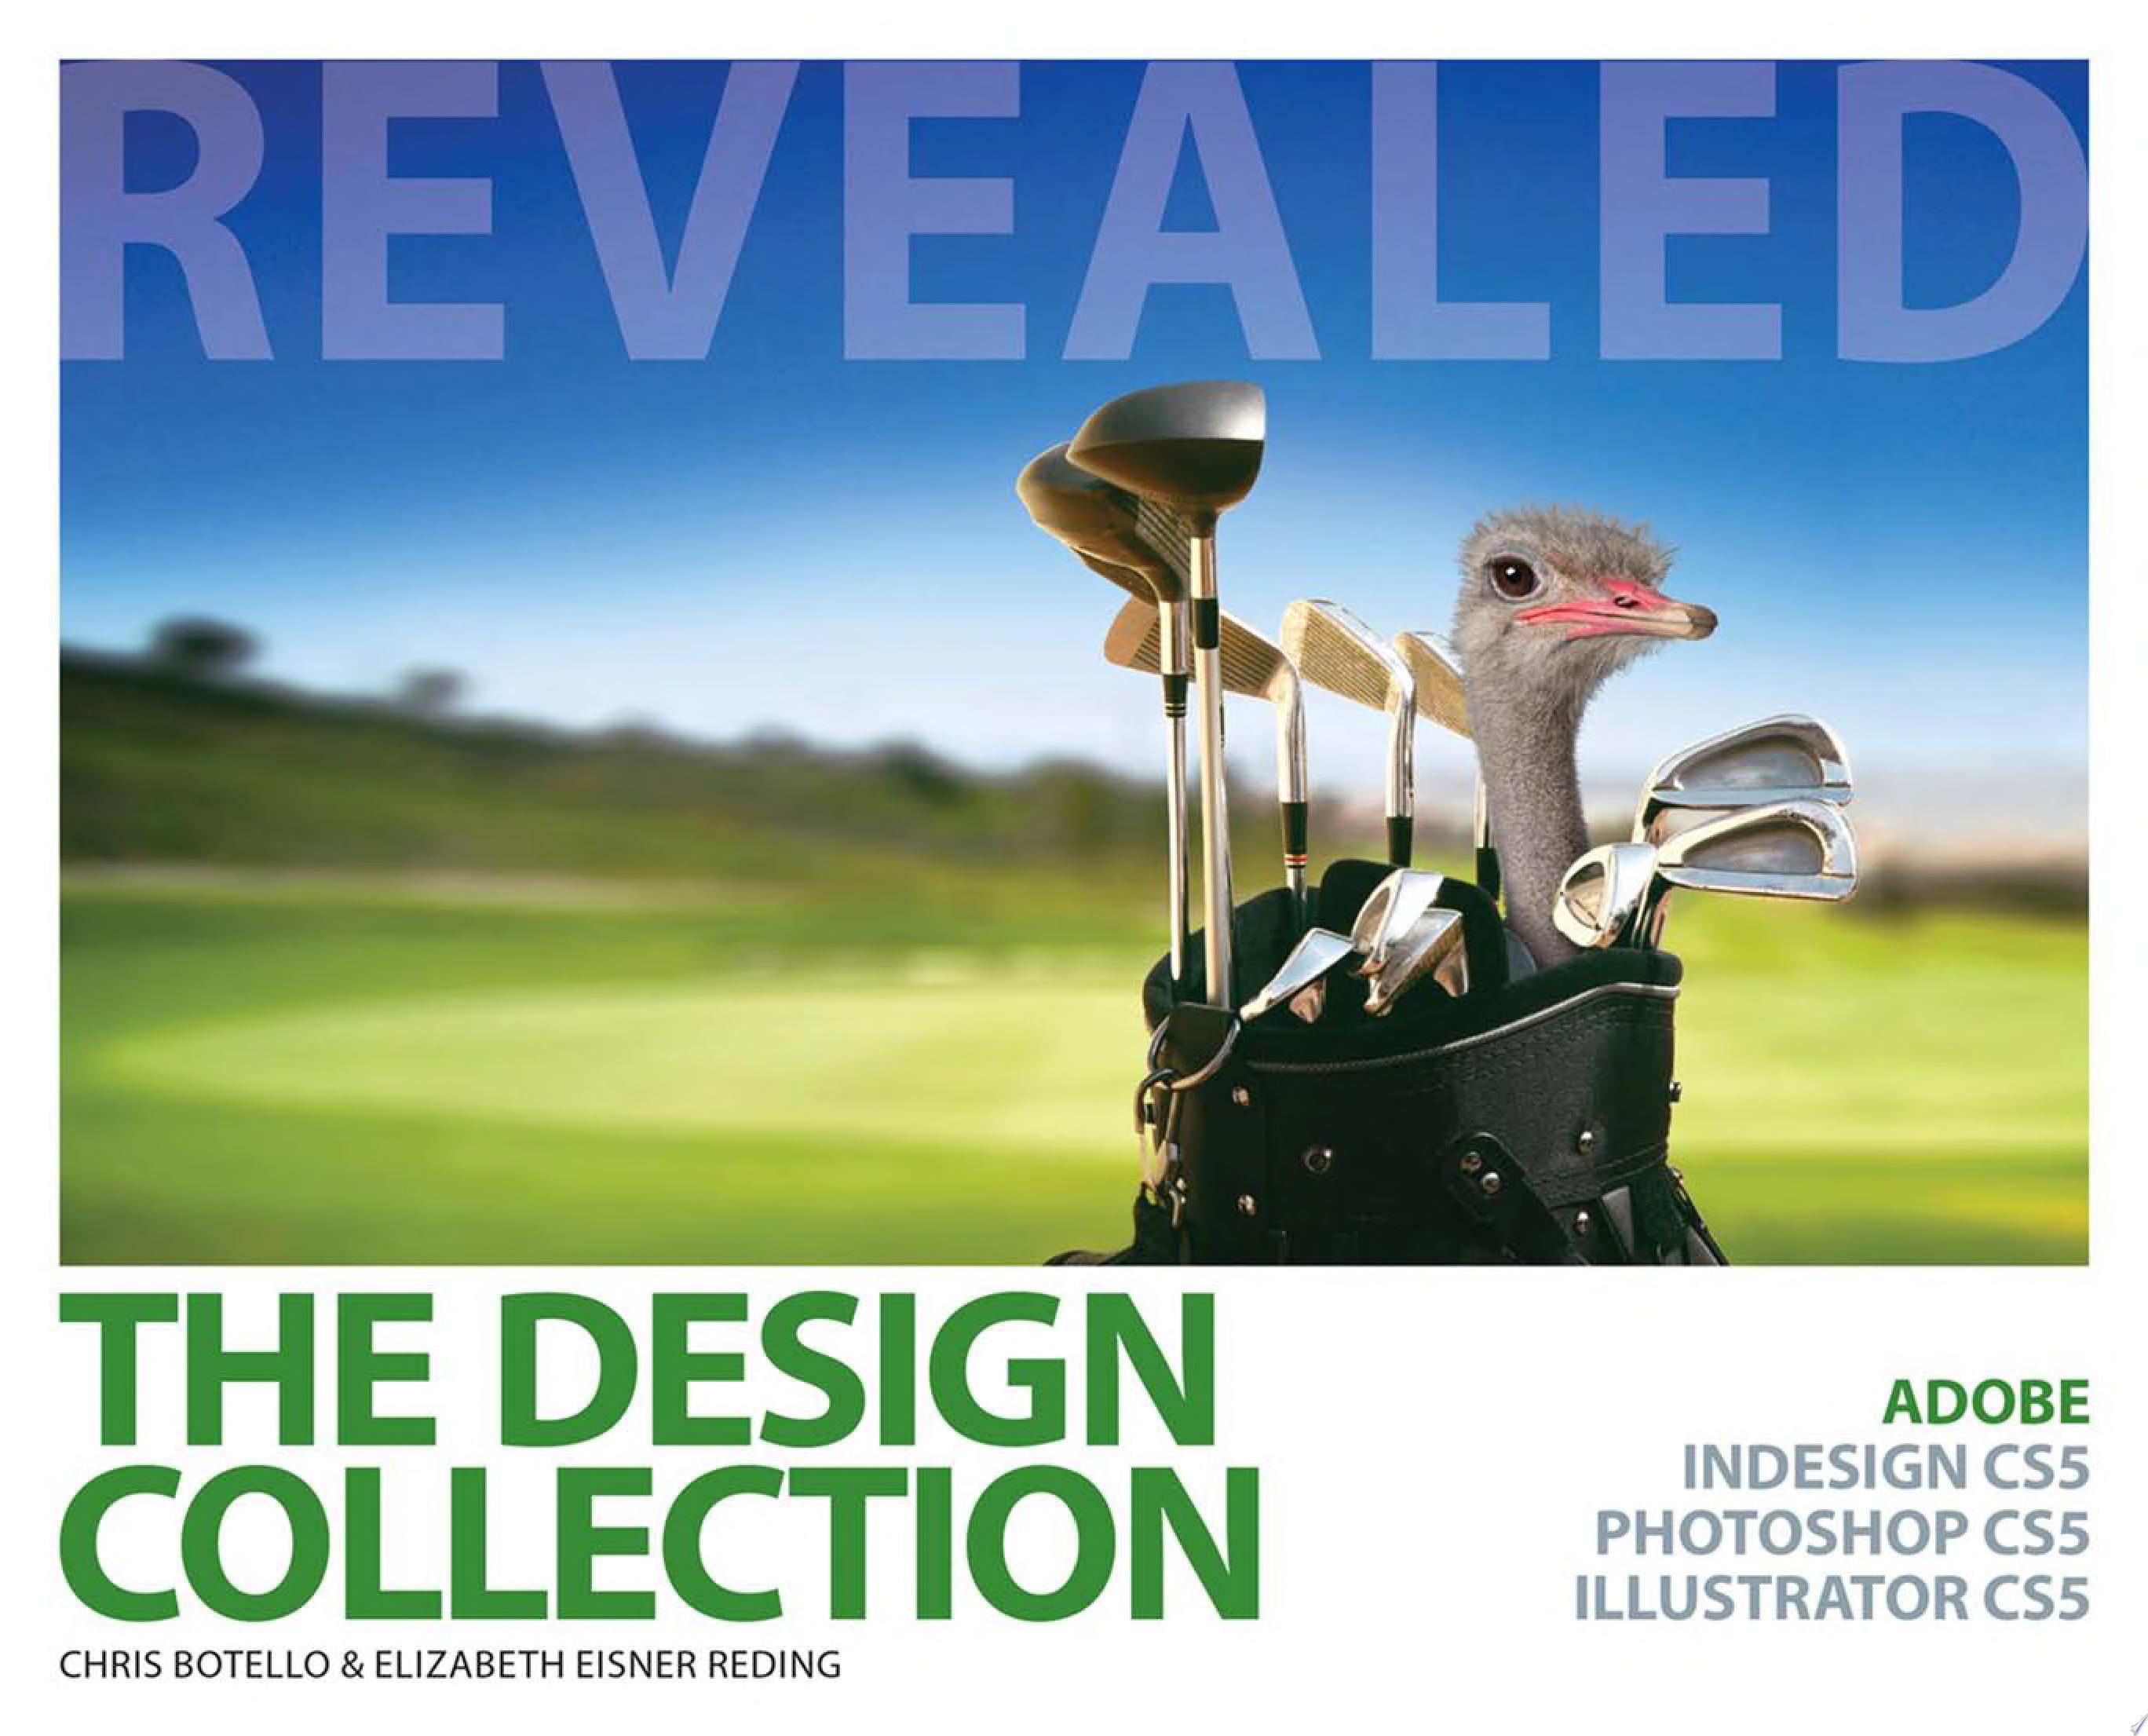 The Design Collection Revealed  Adobe InDesign CS5  Photoshop CS5 and Illustrator CS5